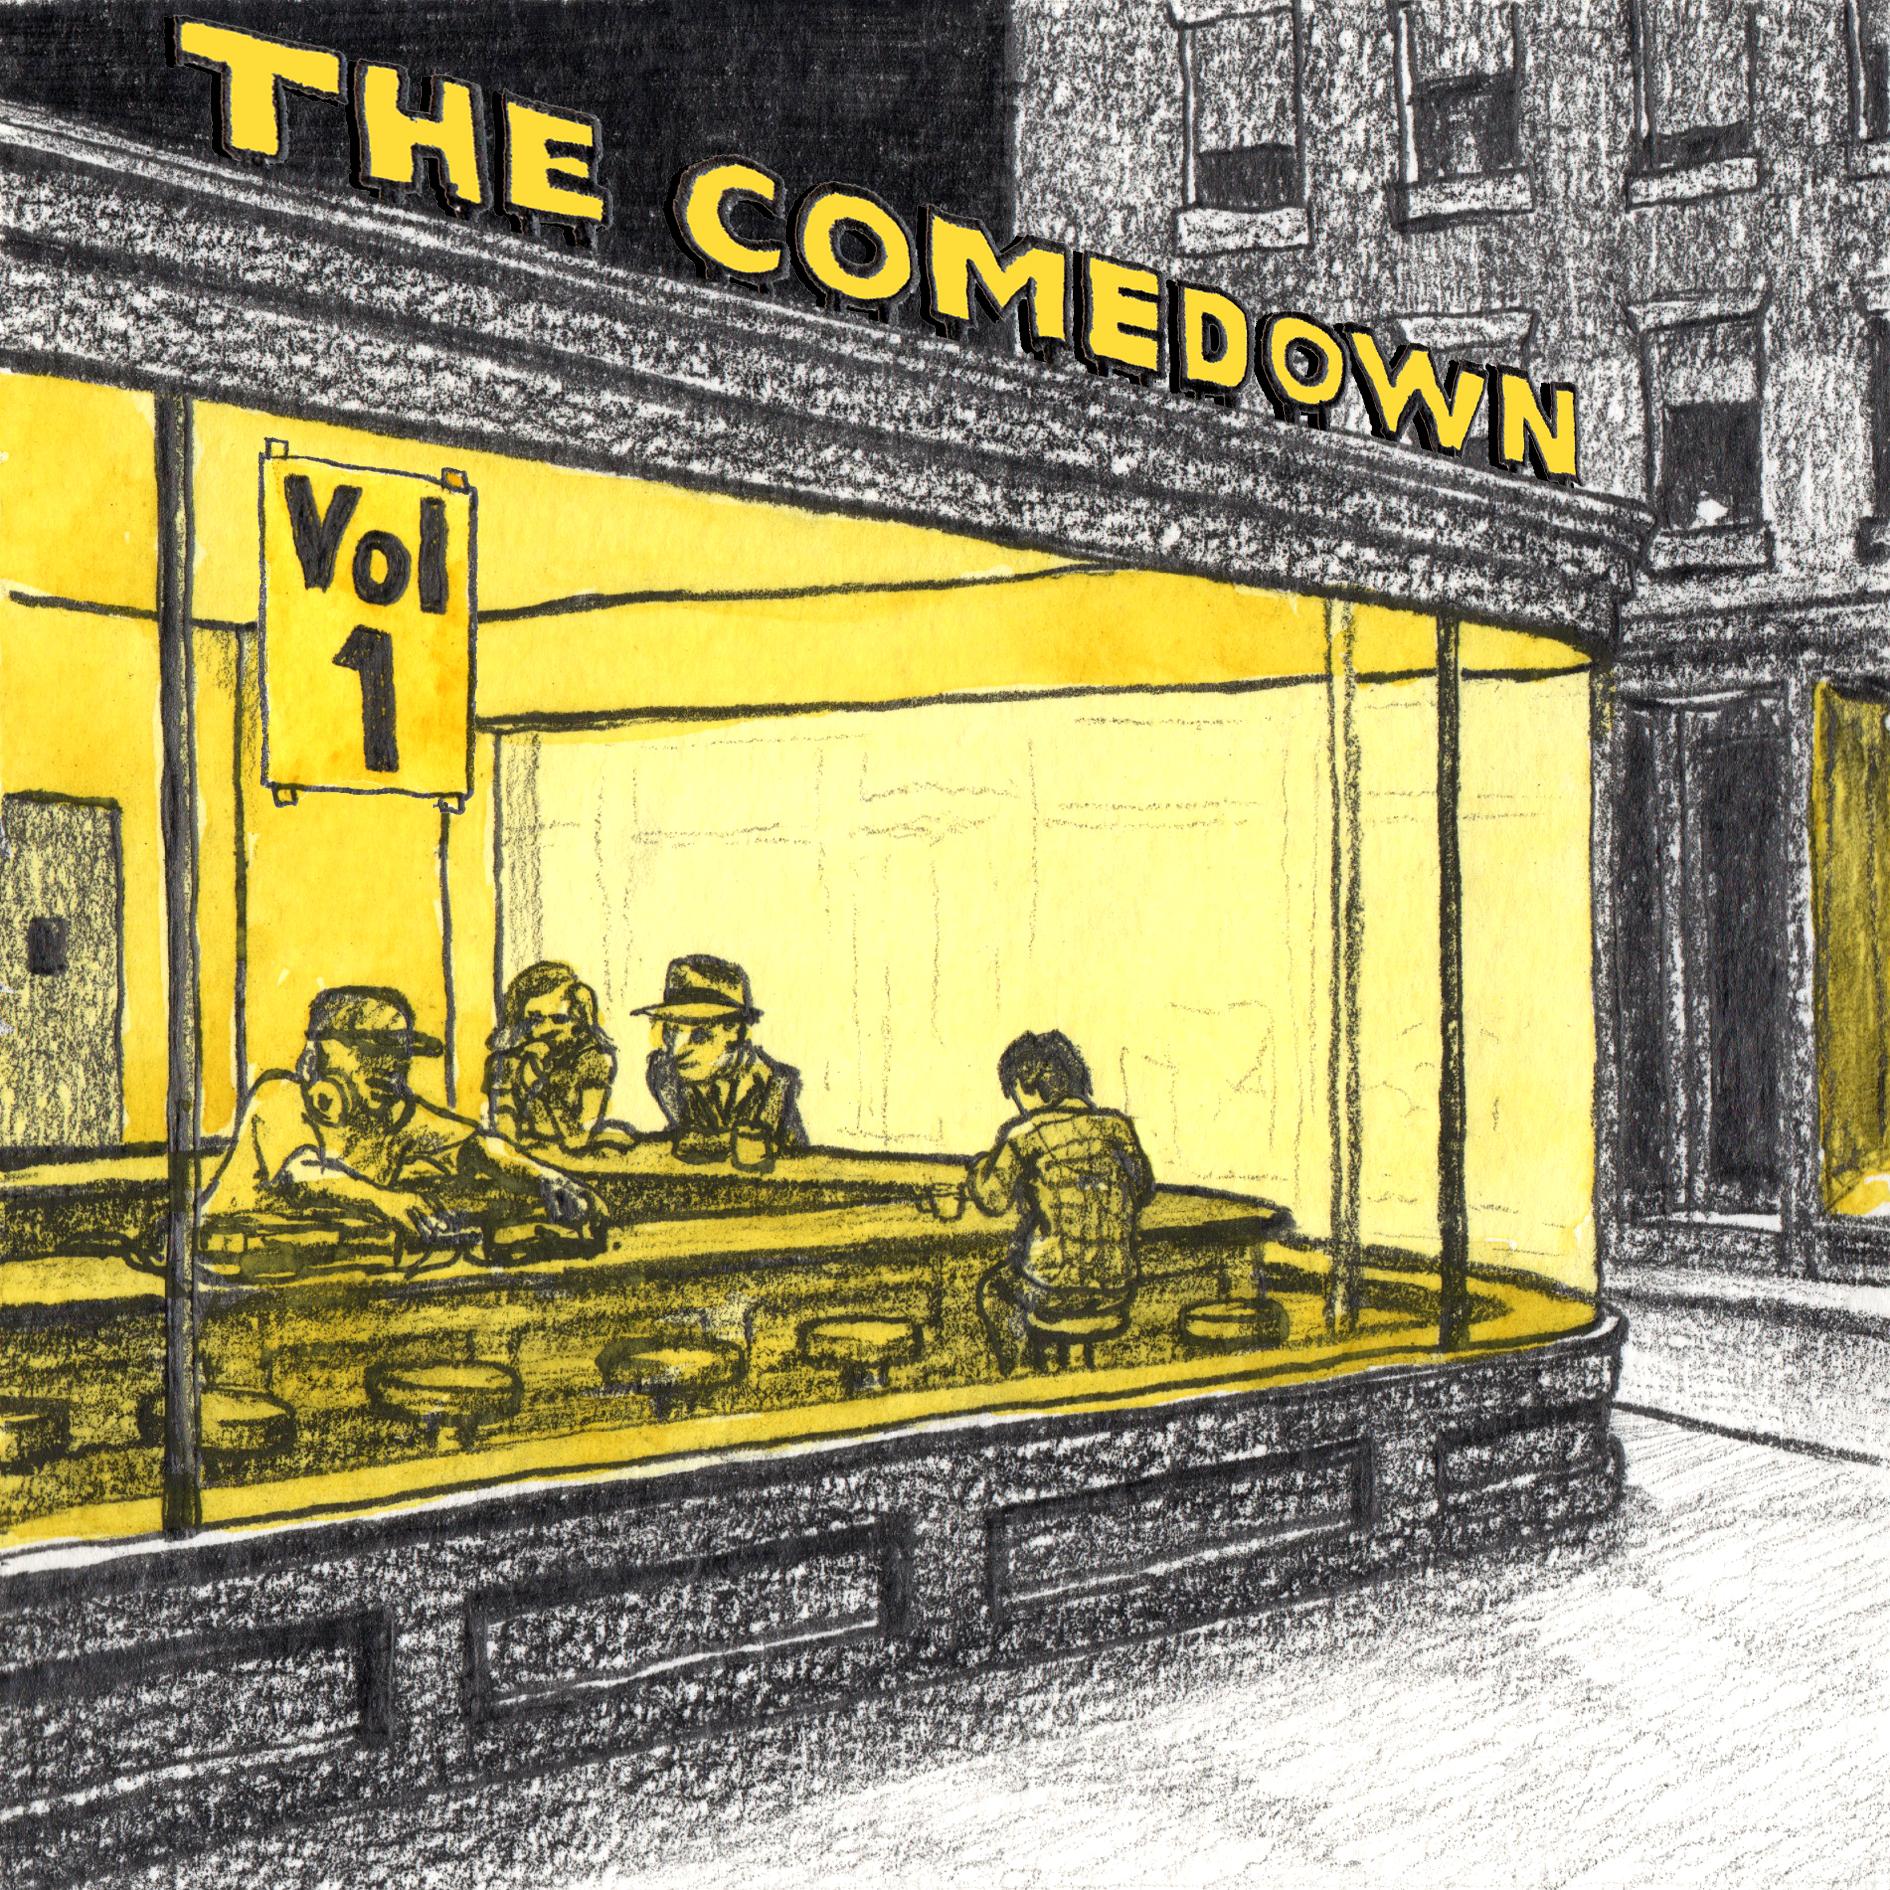 TheComedownVol.1.jpg